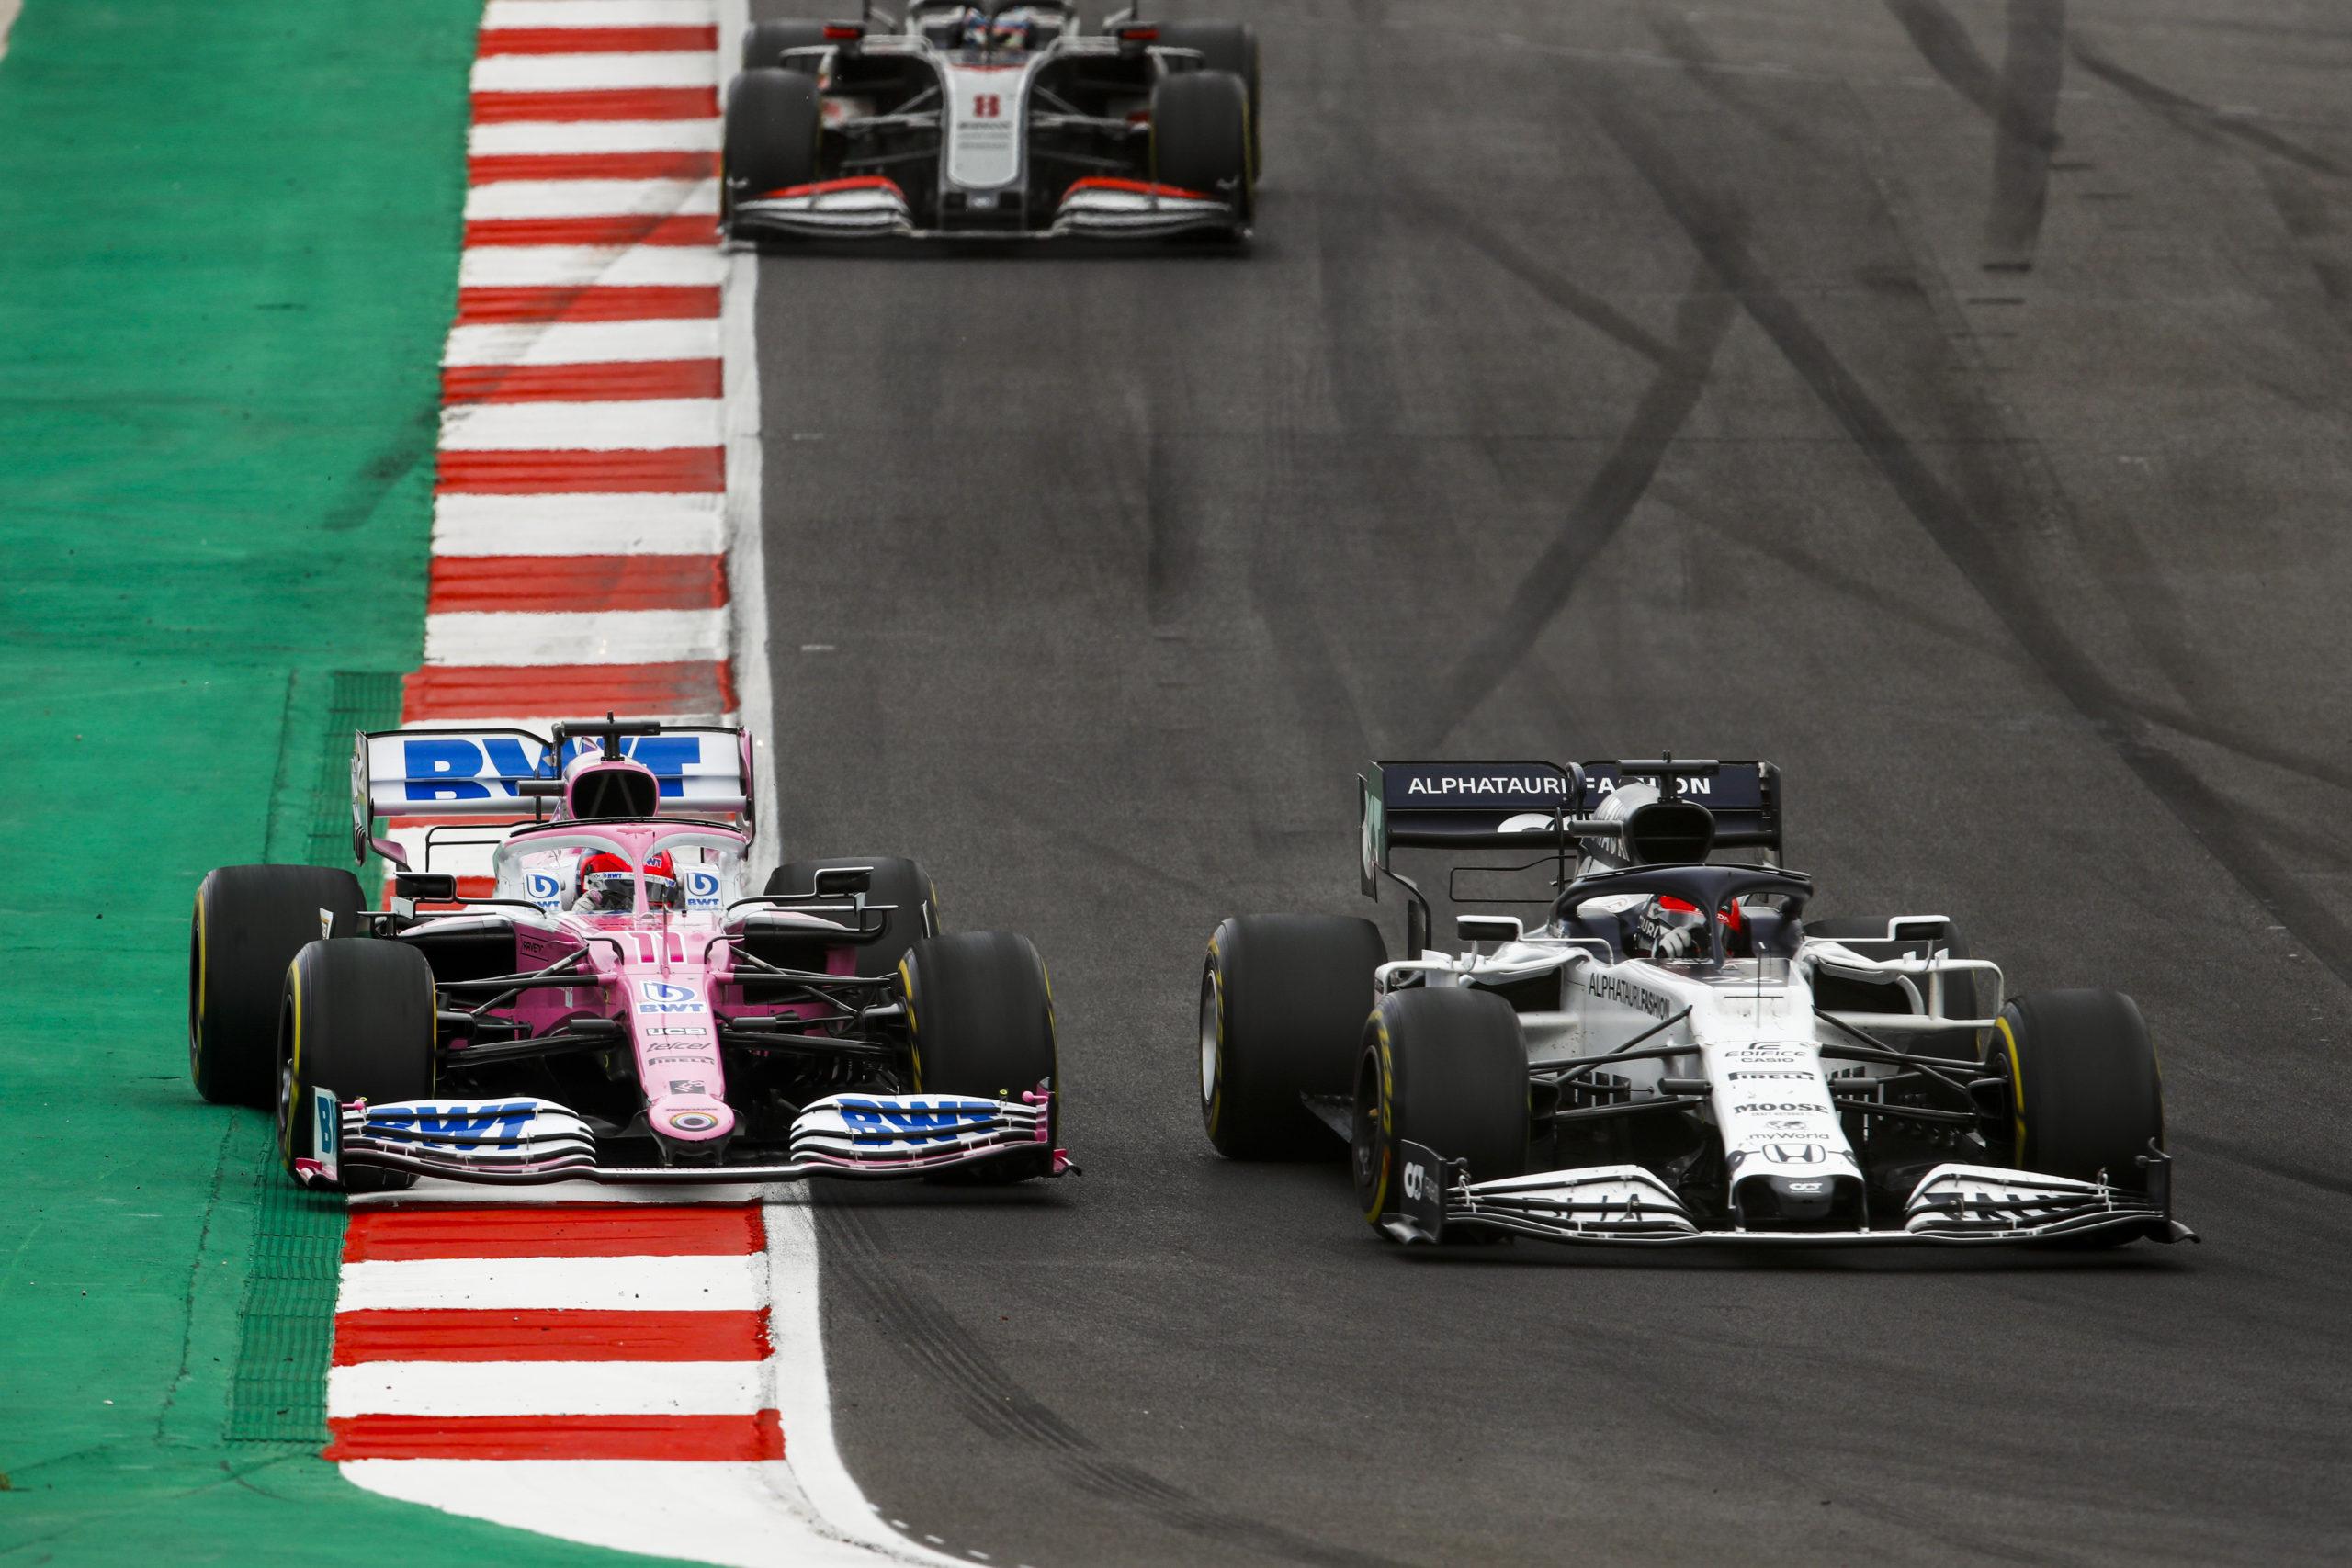 Daniil Kvyat, AlphaTauri AT01, leads Sergio Perez, Racing Point RP20, and Romain Grosjean, Haas VF-20